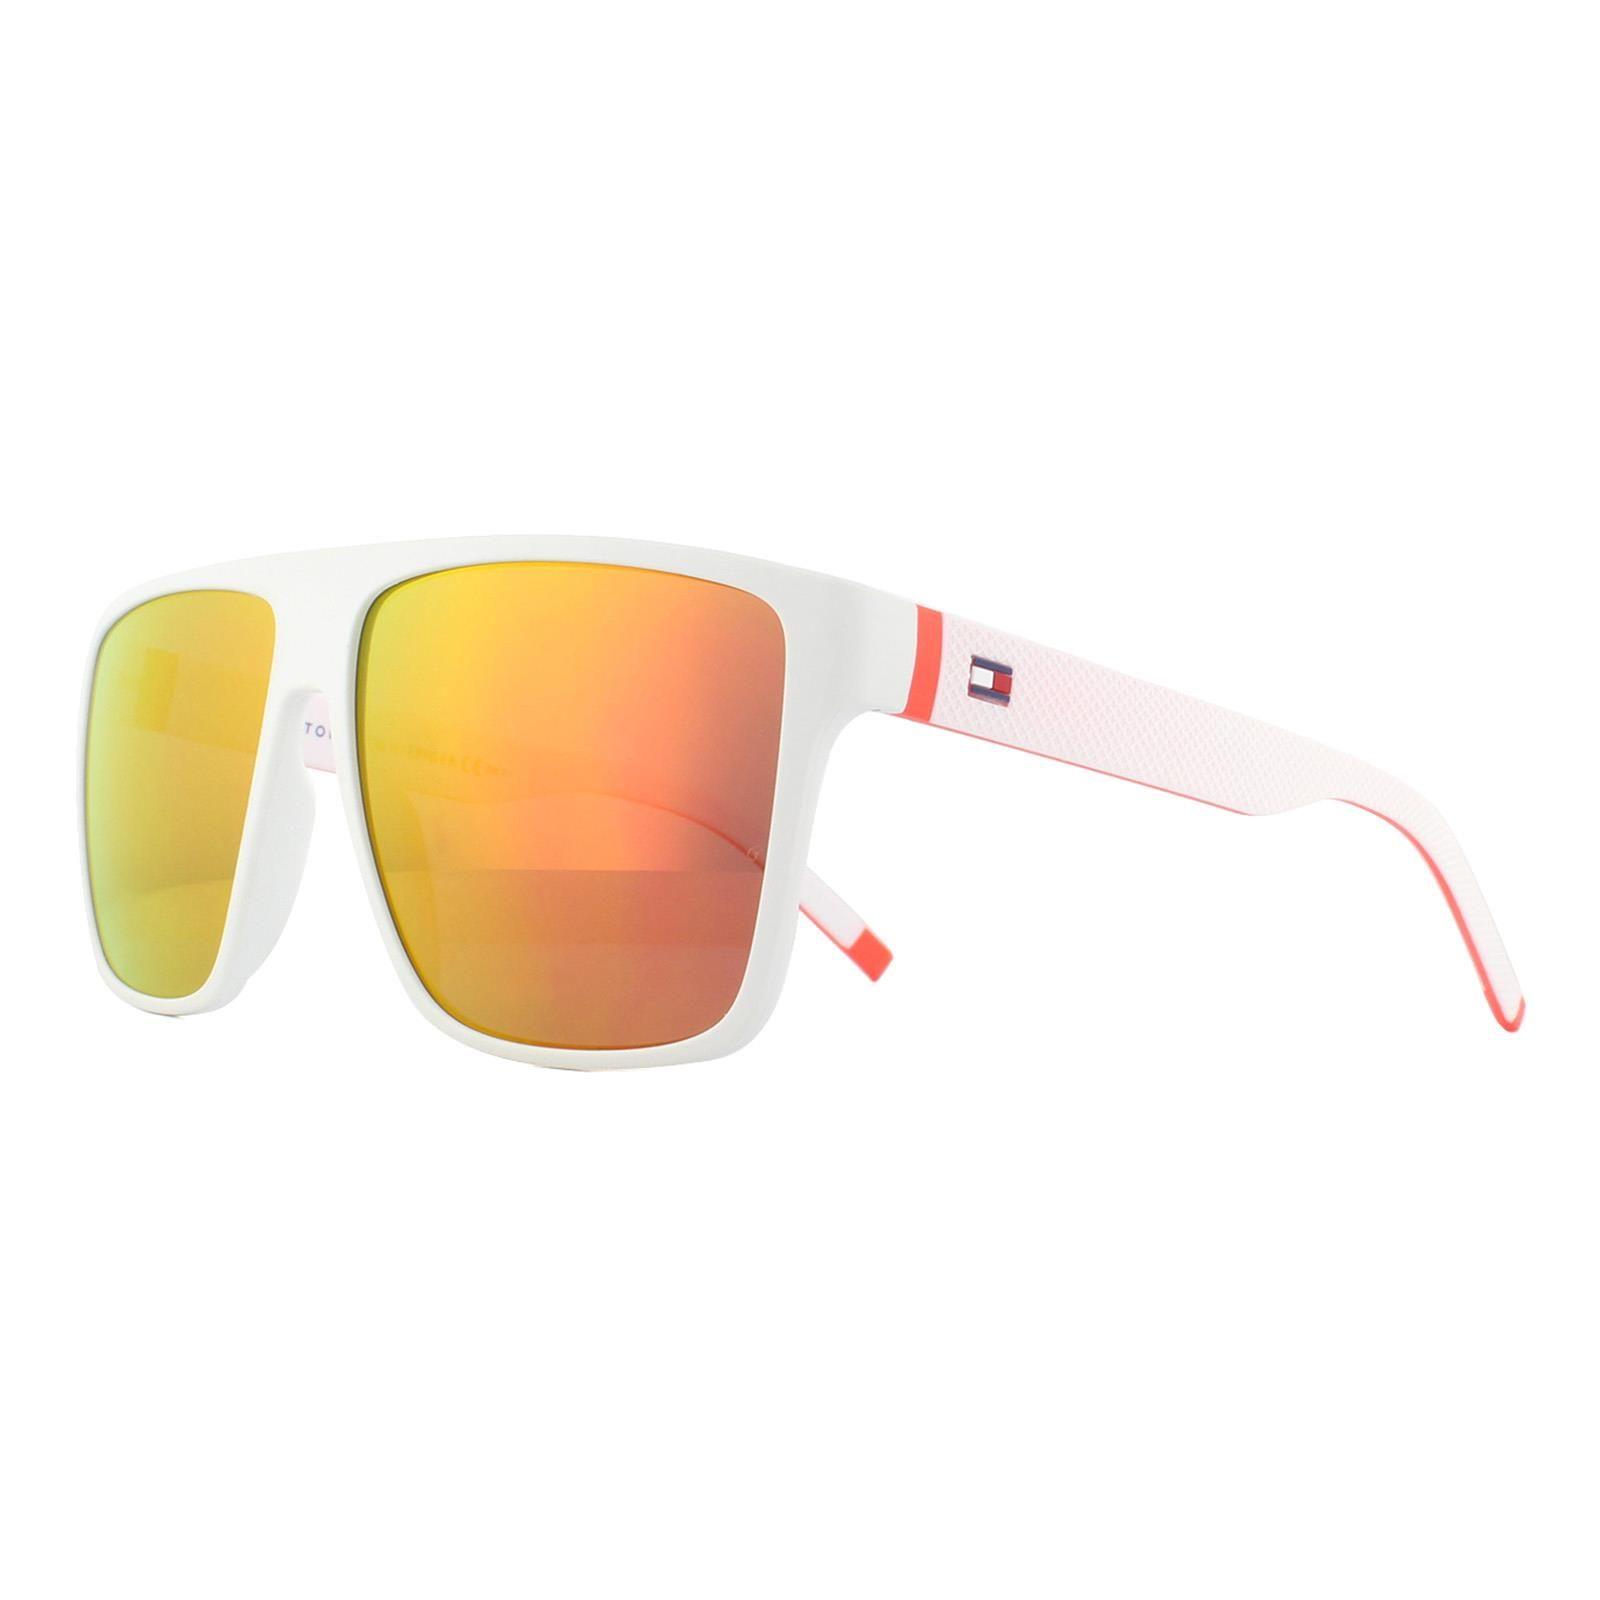 Tommy Hilfiger Sunglasses Th 1717/S E0G Uw Matte White Orange Mirror